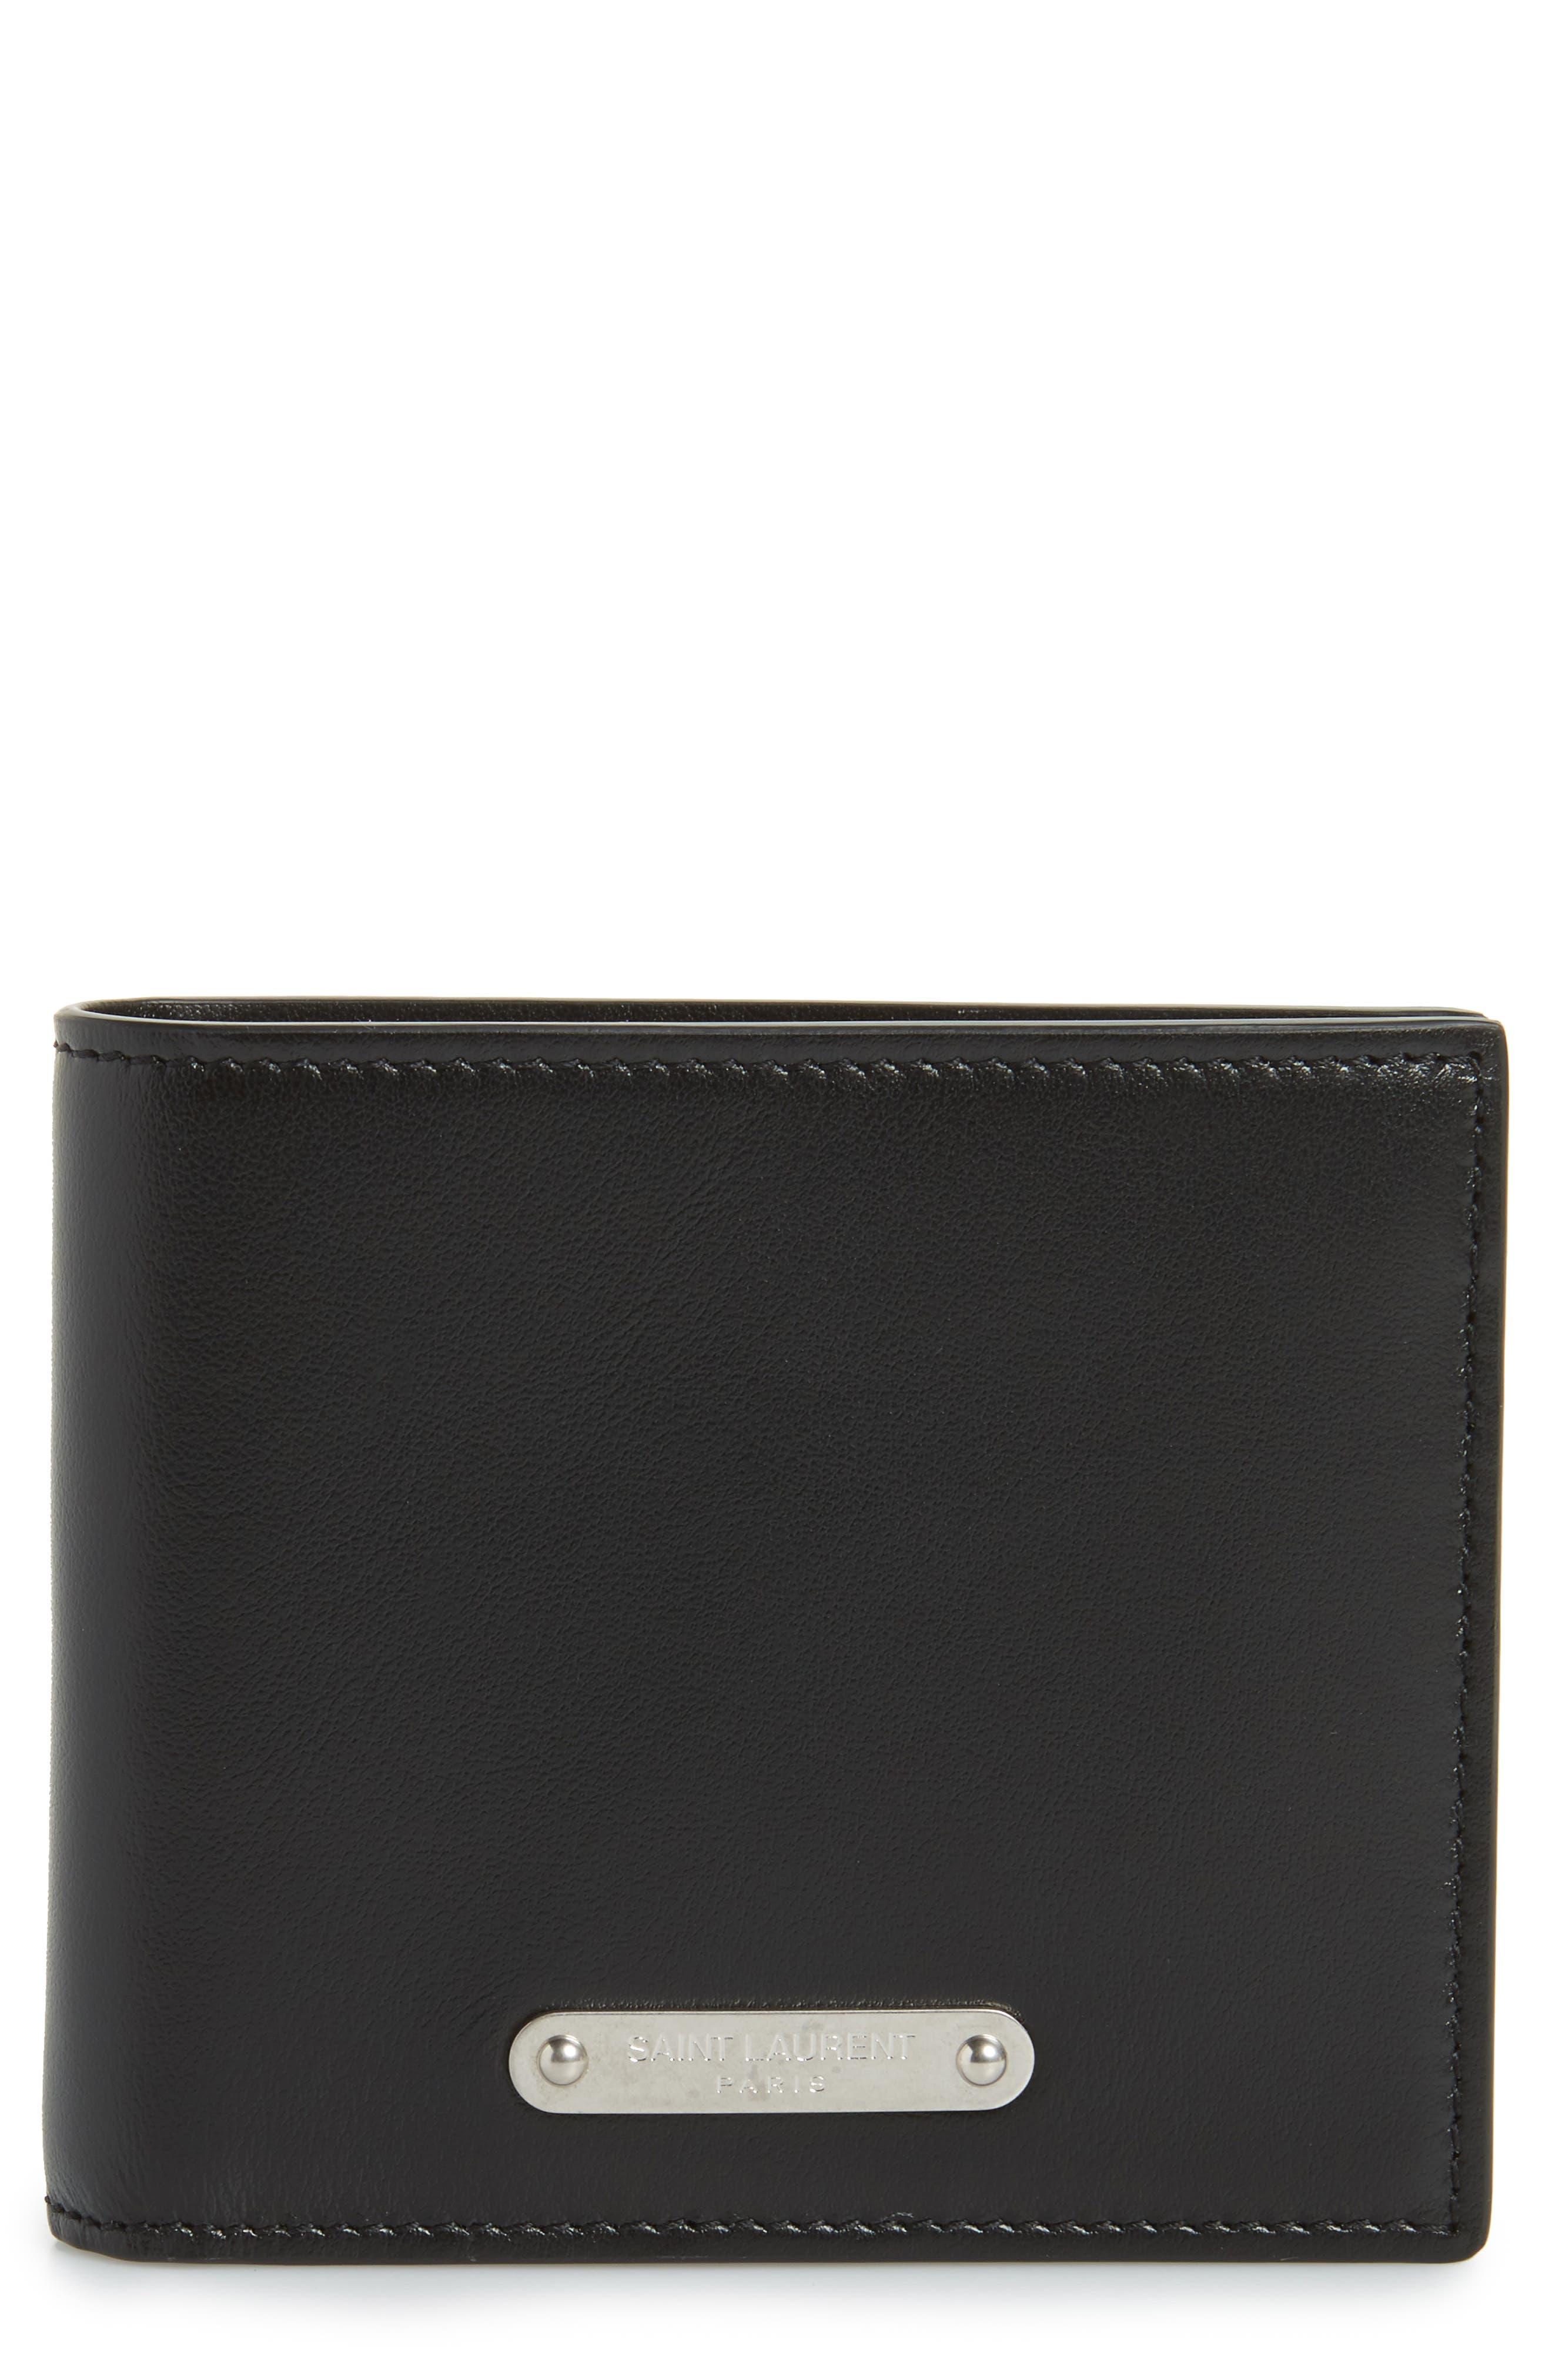 East/West Leather Wallet,                         Main,                         color, Black